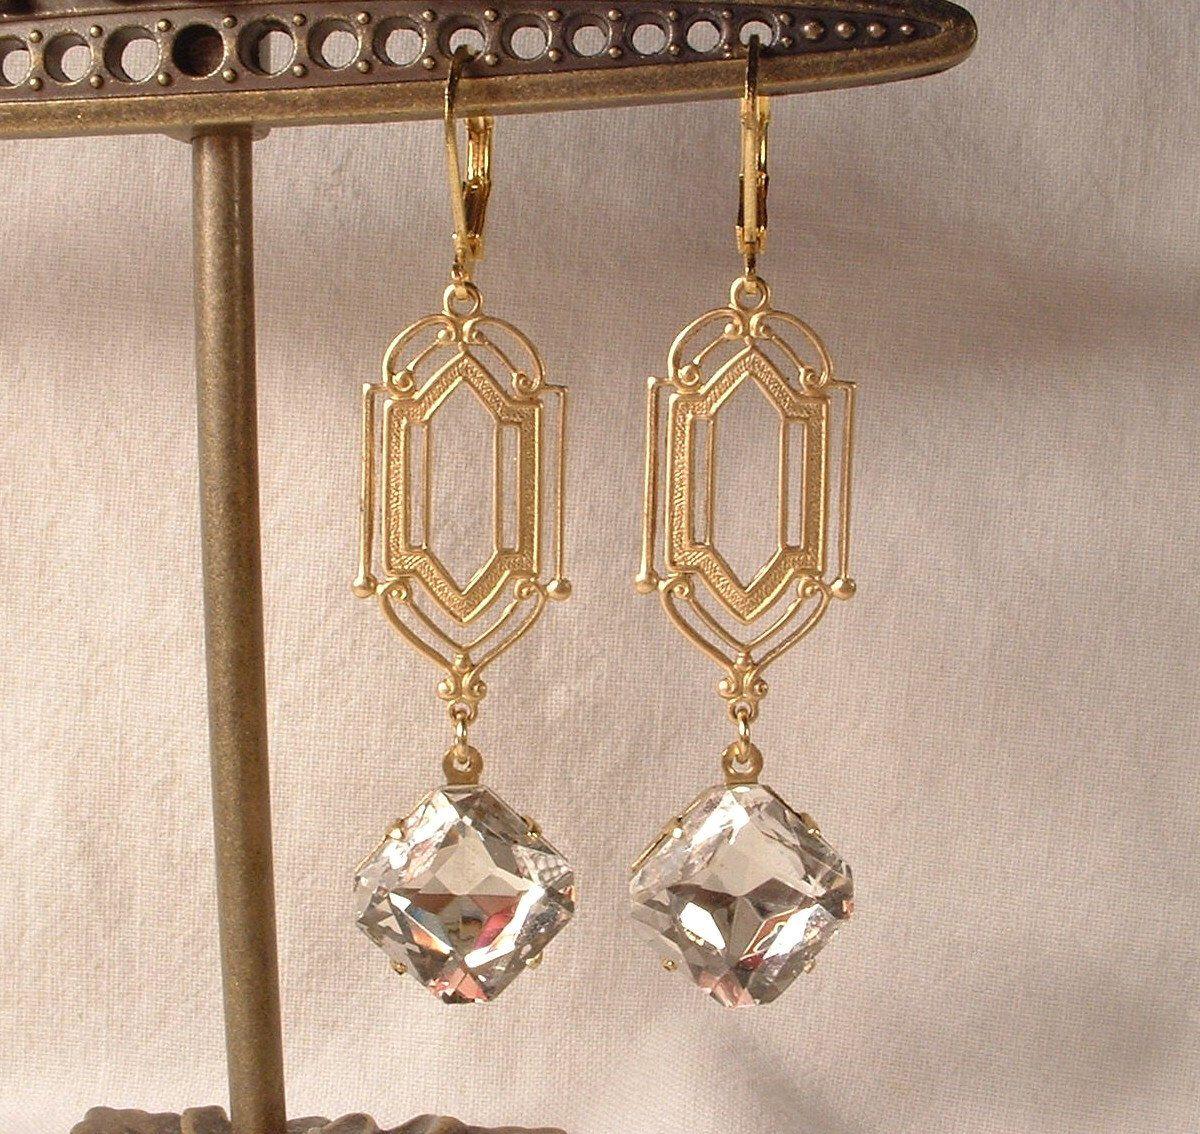 Vintage Art Deco Clear Rhinestone Gold Dangle Earrings, Long 1920s Bridal Earrings, Flapper Great Gatsby Wedding Jewelry Bridesmaids Gift by AmoreTreasure on Etsy https://www.etsy.com/listing/159552950/vintage-art-deco-clear-rhinestone-gold